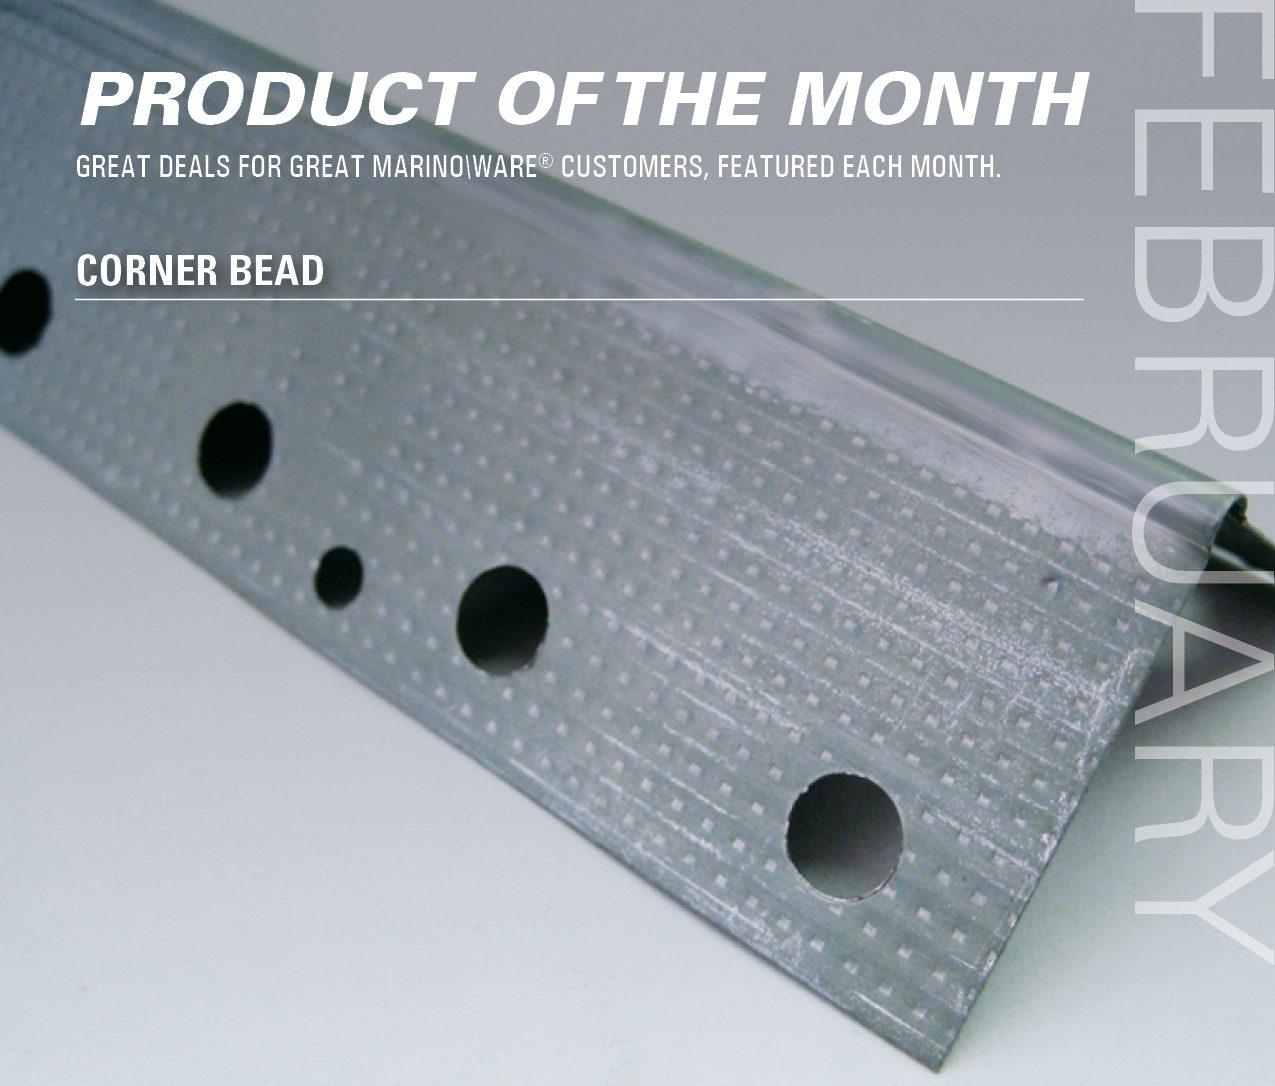 Corner Bead, Metal Corner Bead Manufacturer, Metal Drywall Corner Bead